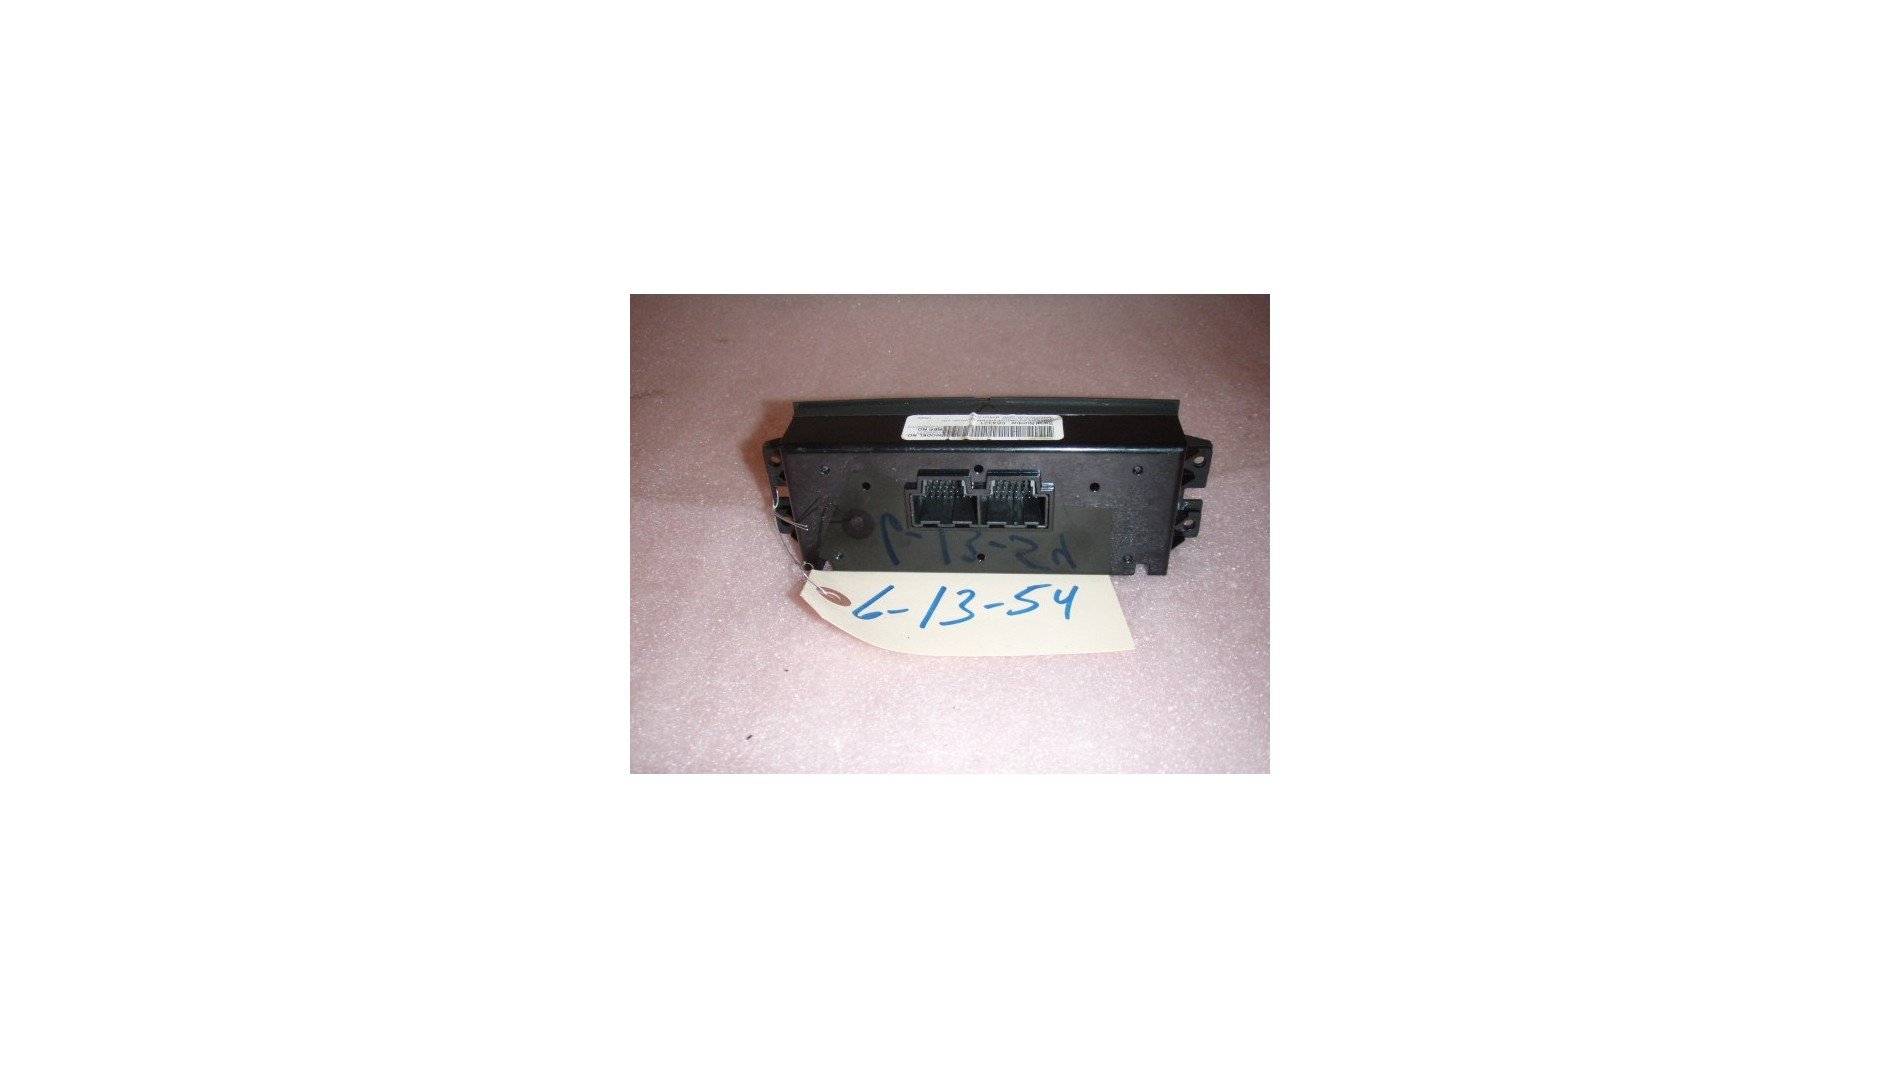 1186-thickbox_default  Jeep Patriot Fuse Box on